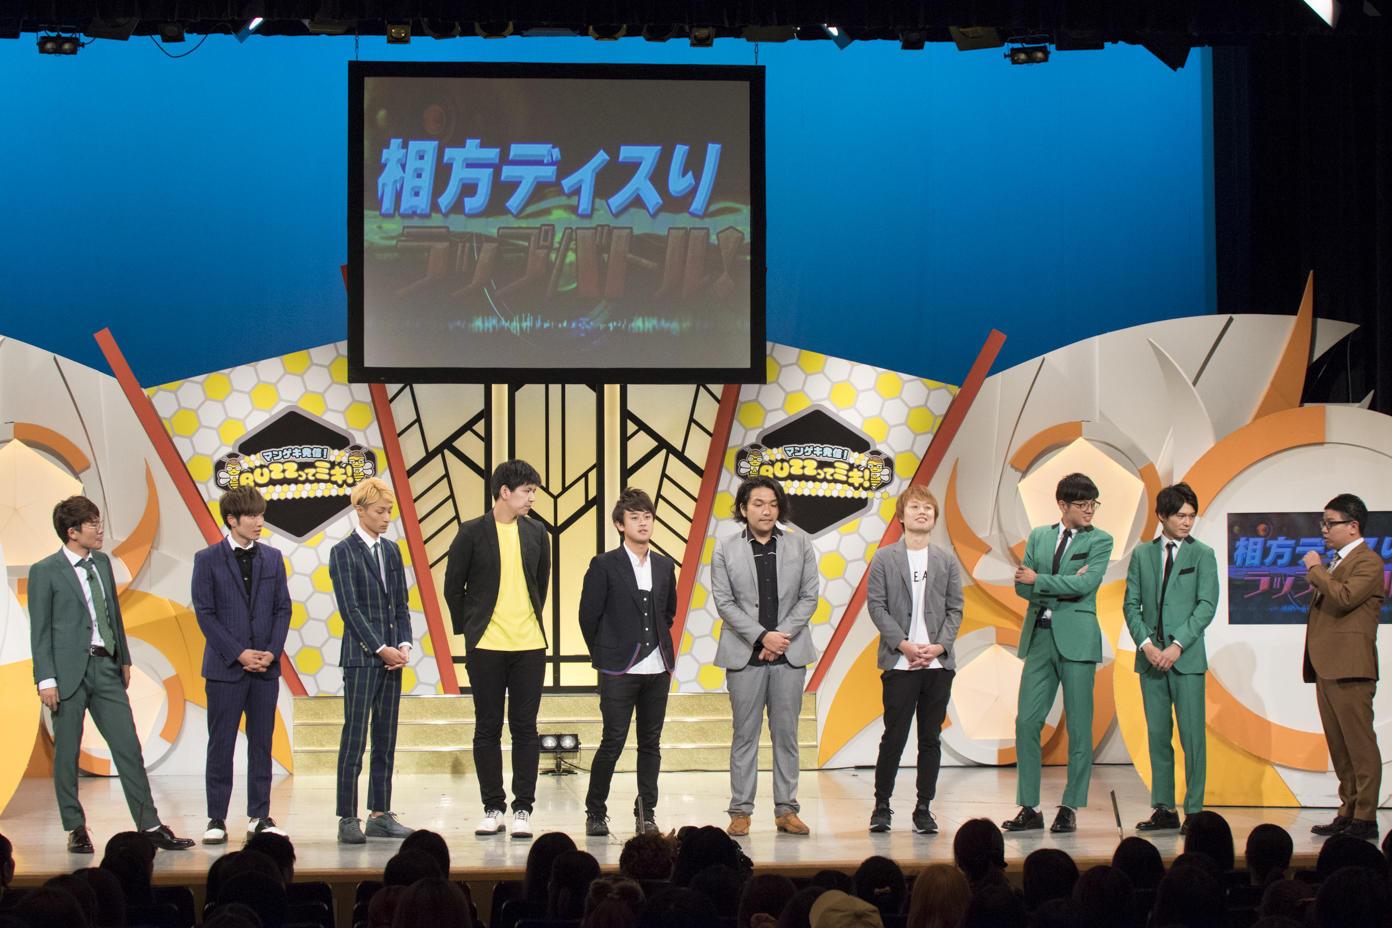 http://news.yoshimoto.co.jp/20170908070113-f3a982c896248aabed647f261466f013ff4f7931.jpg